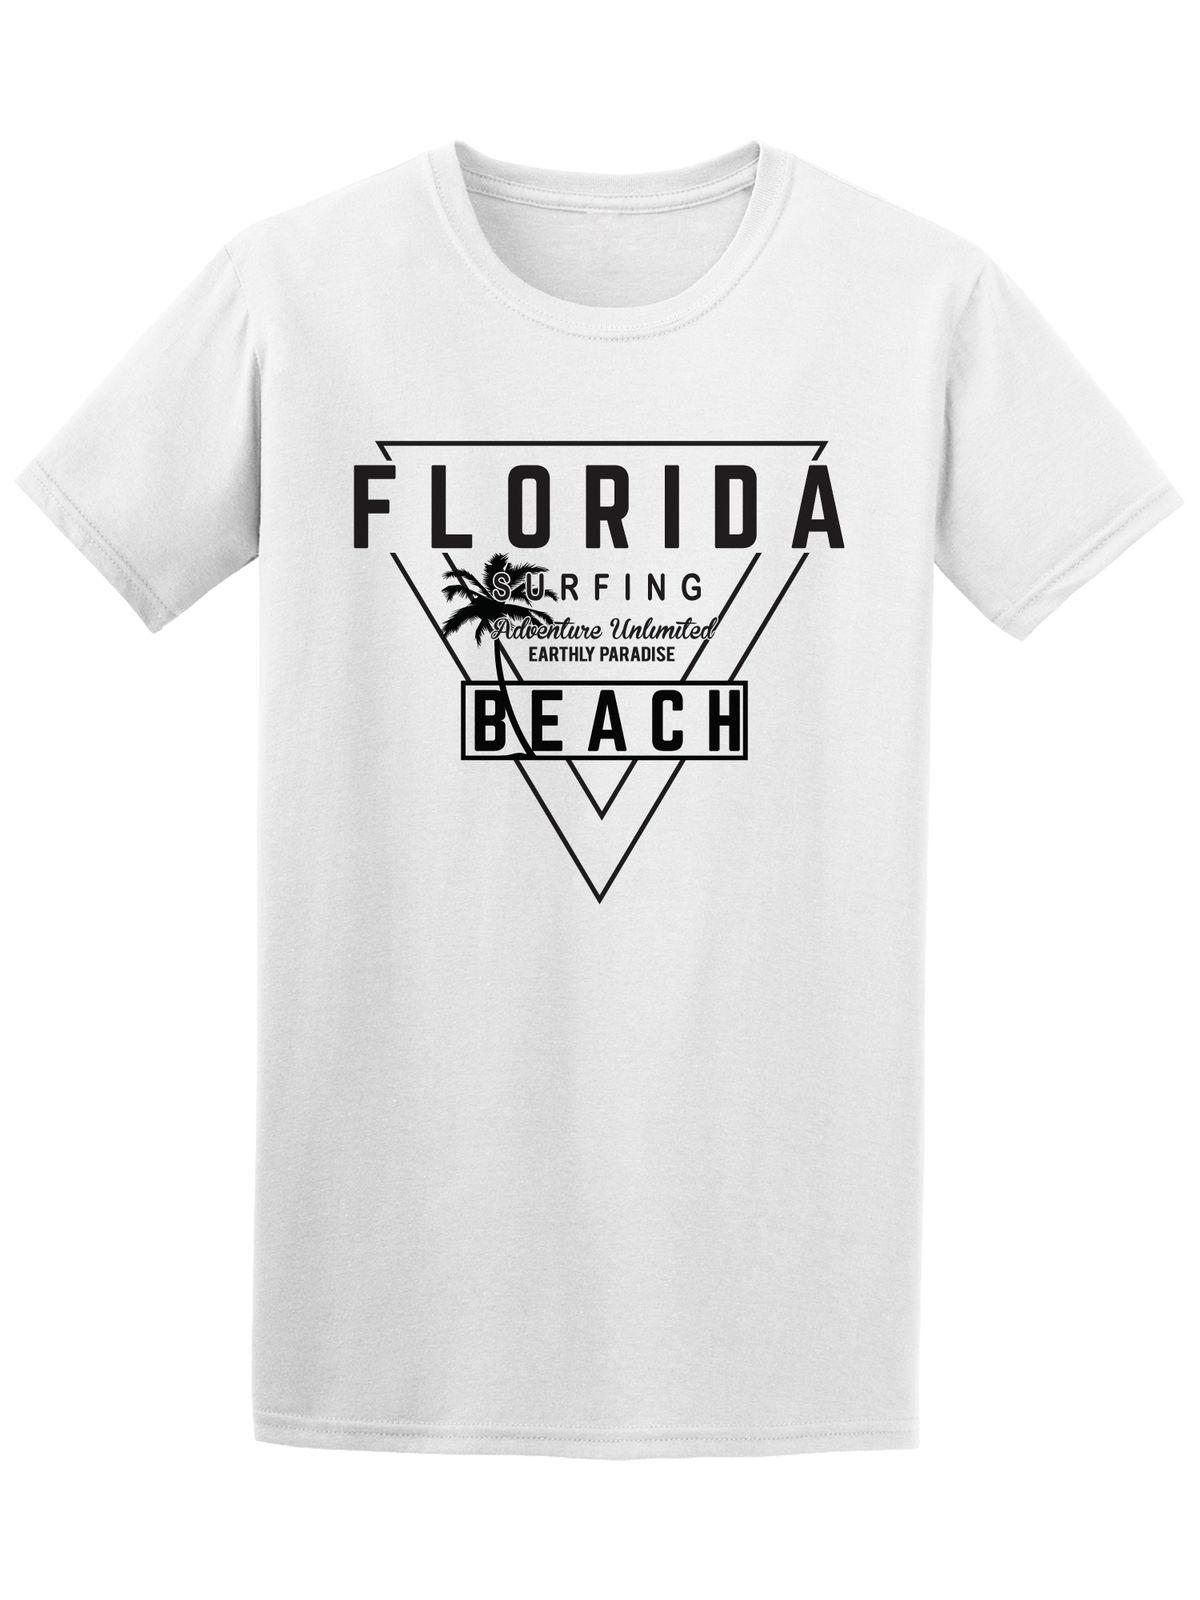 Florida Surfinger Beach Surfer Design Tee Tops Tees Printed Men T